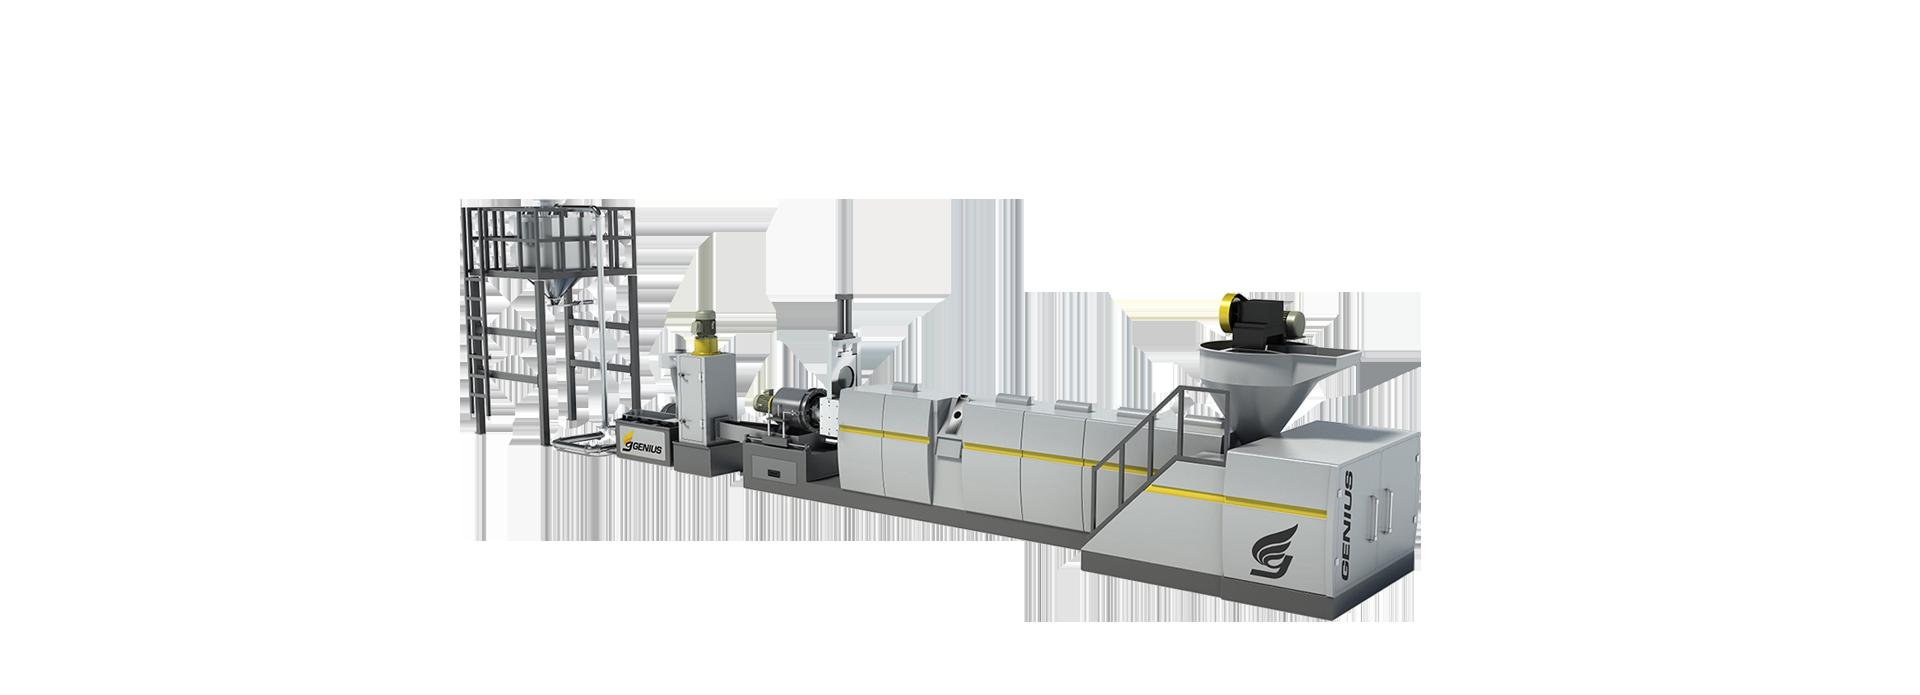 Force Hopper Feeding Plastic Recycling Machine